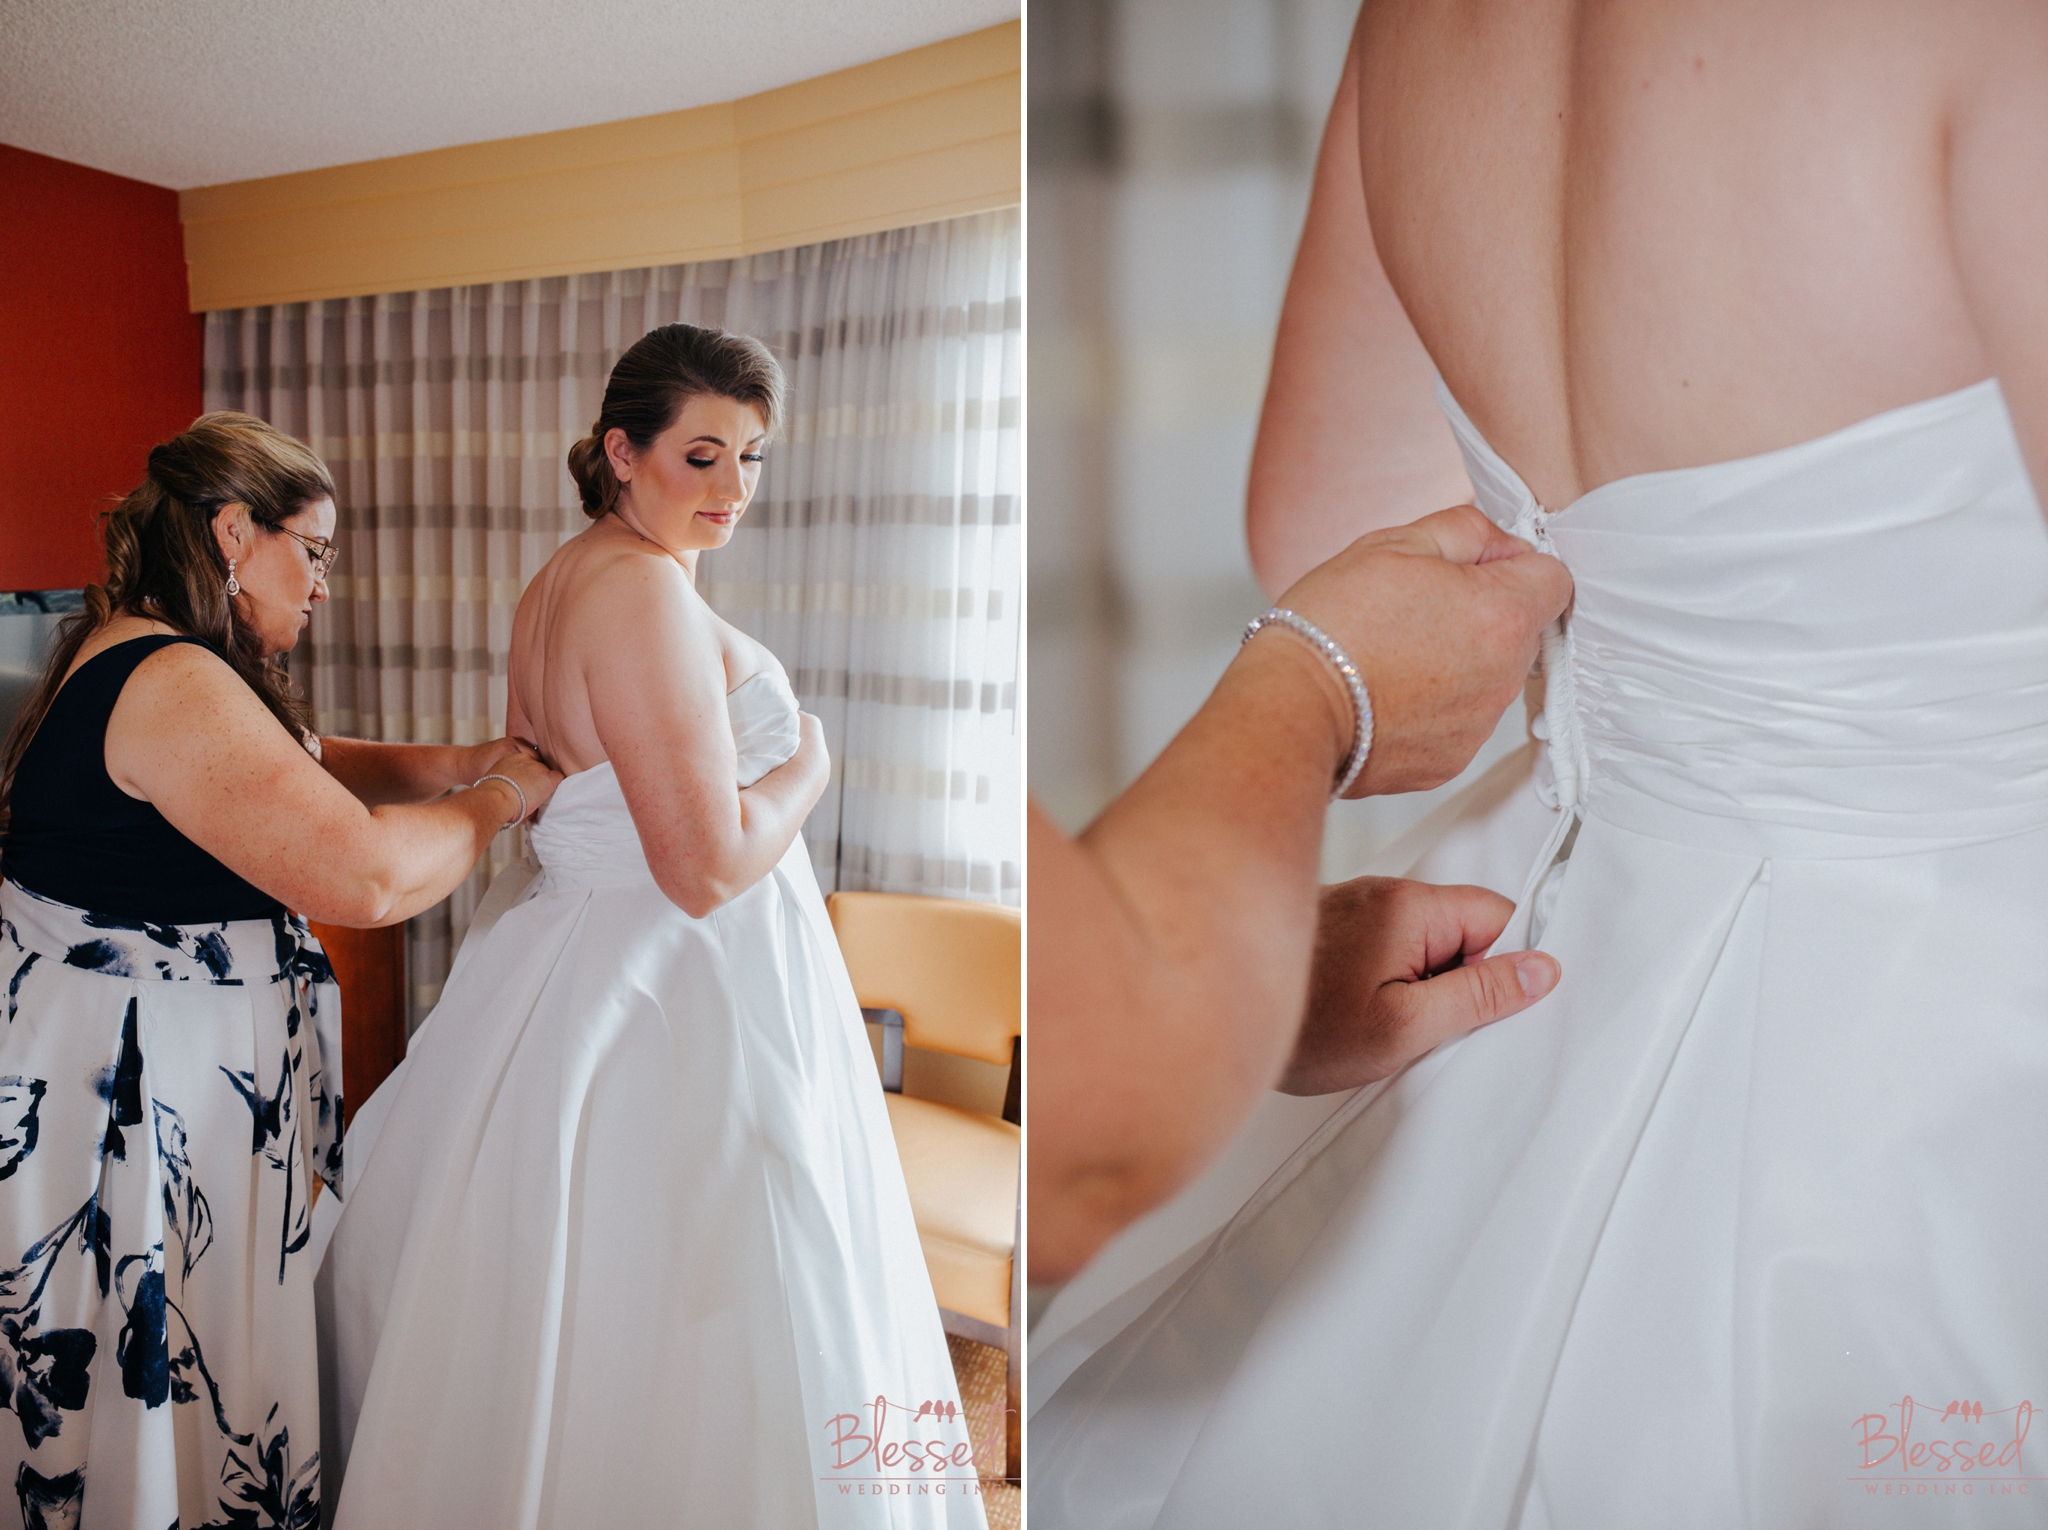 Orfila Vinery Wedding by Blessed Wedding Photography 13.jpg